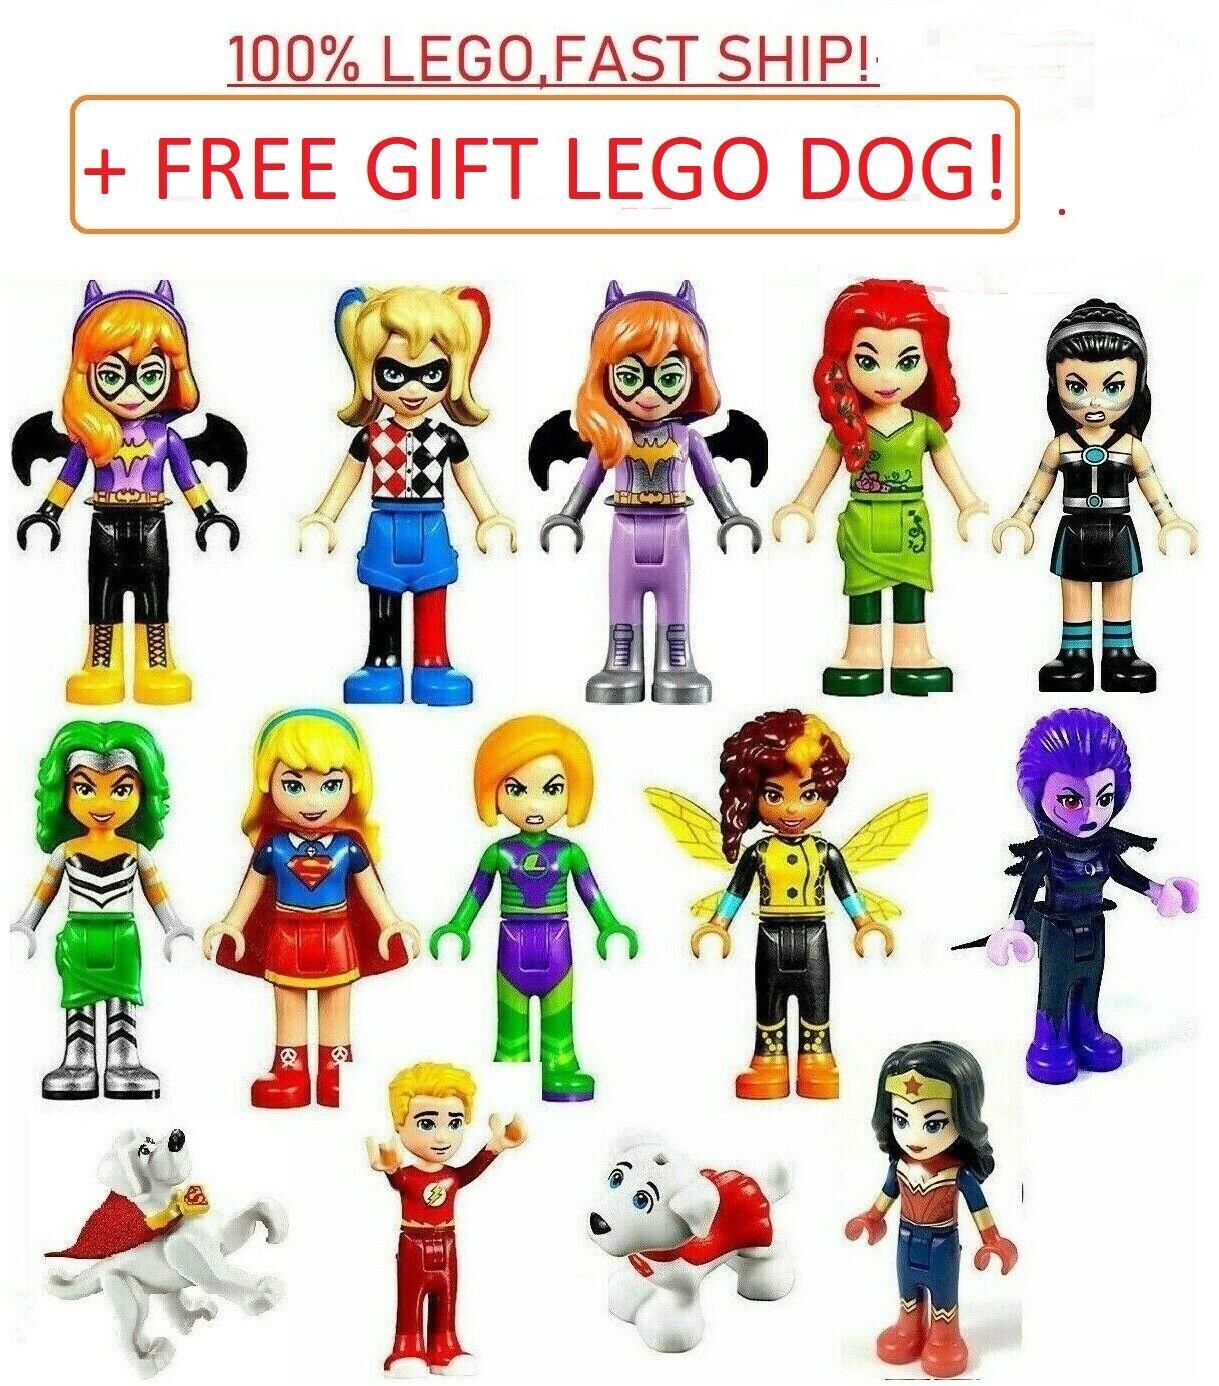 shg016 NEW LEGO Eclipso FROM SET 41239 DC SUPER HERO GIRLS